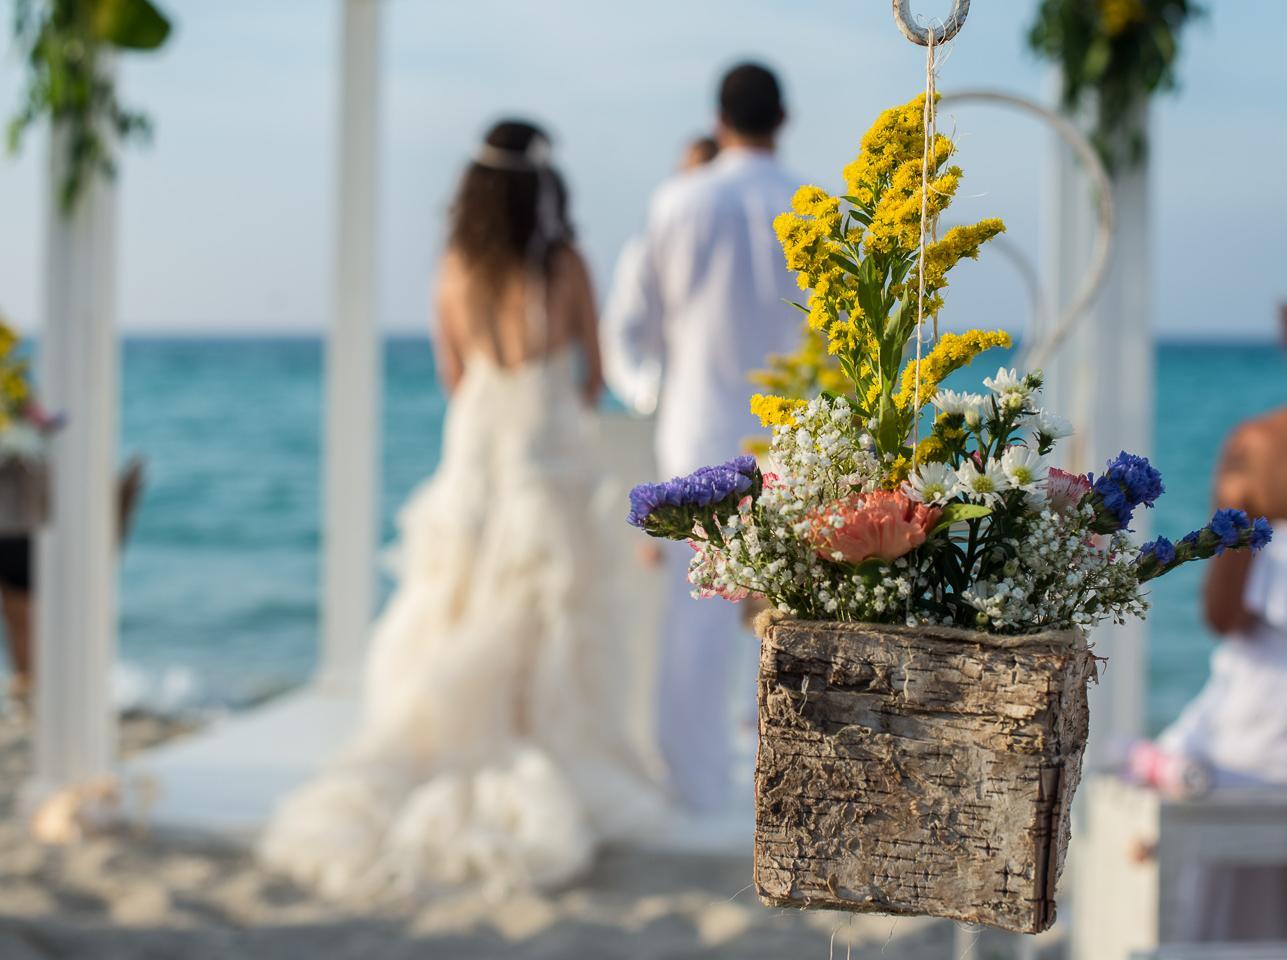 bodas-rustico-playa-cuba-2152.jpg